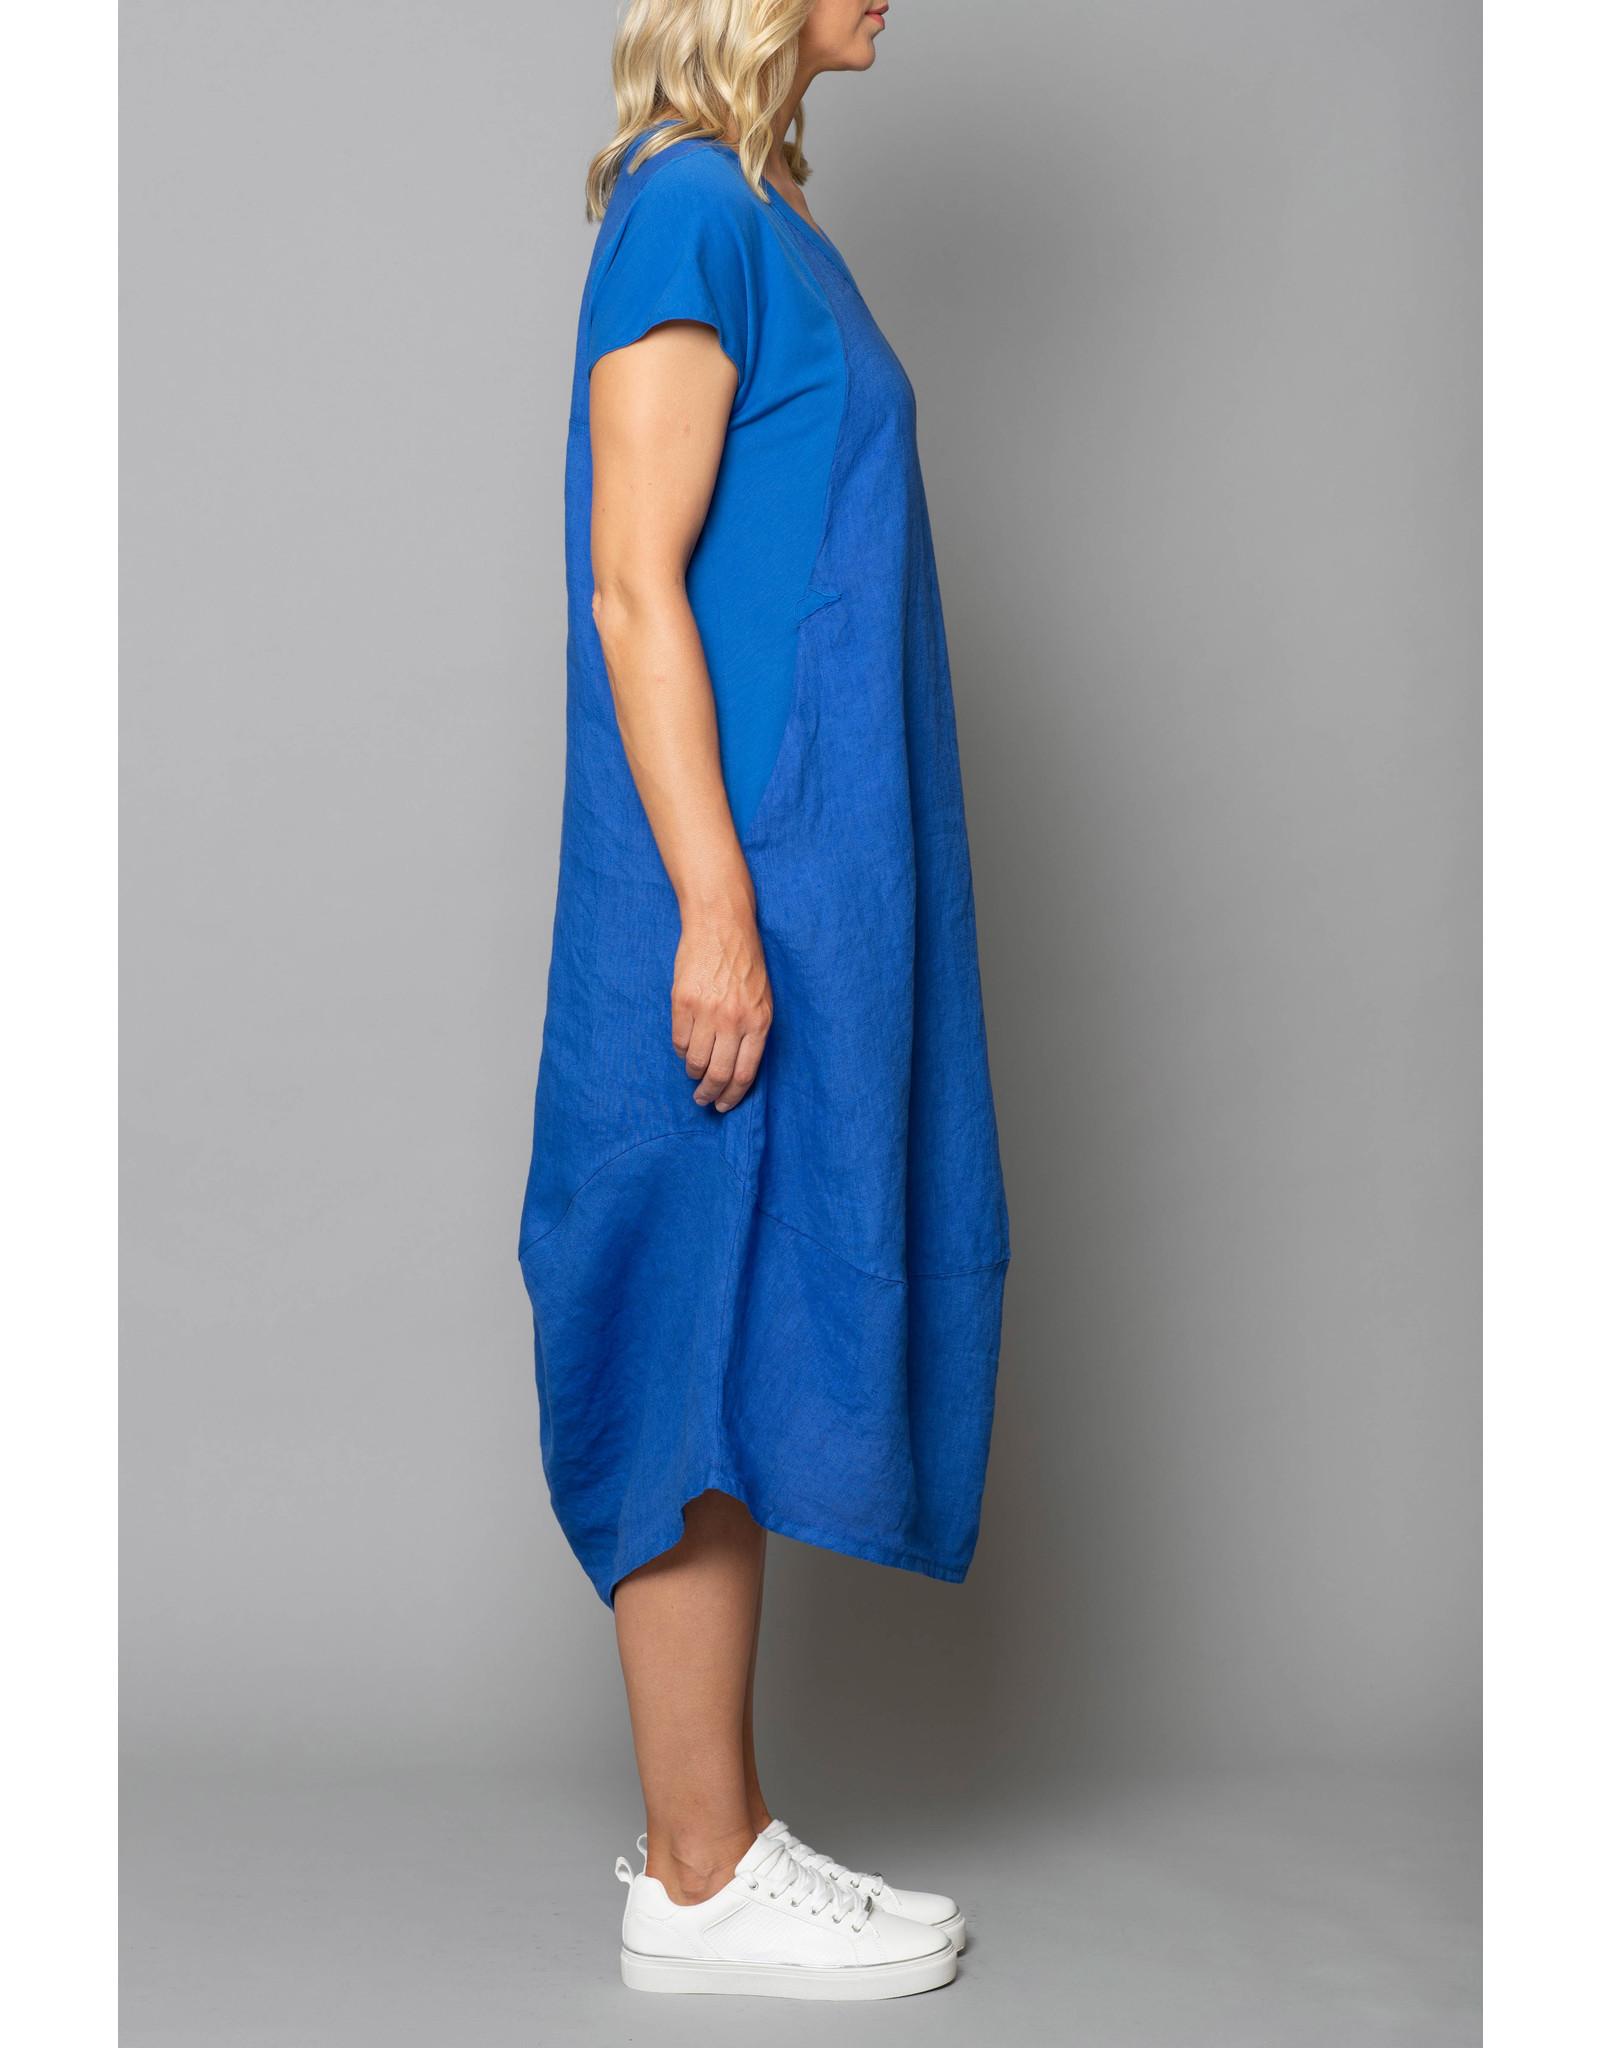 Peruzzi Jersey Shoulder Dress